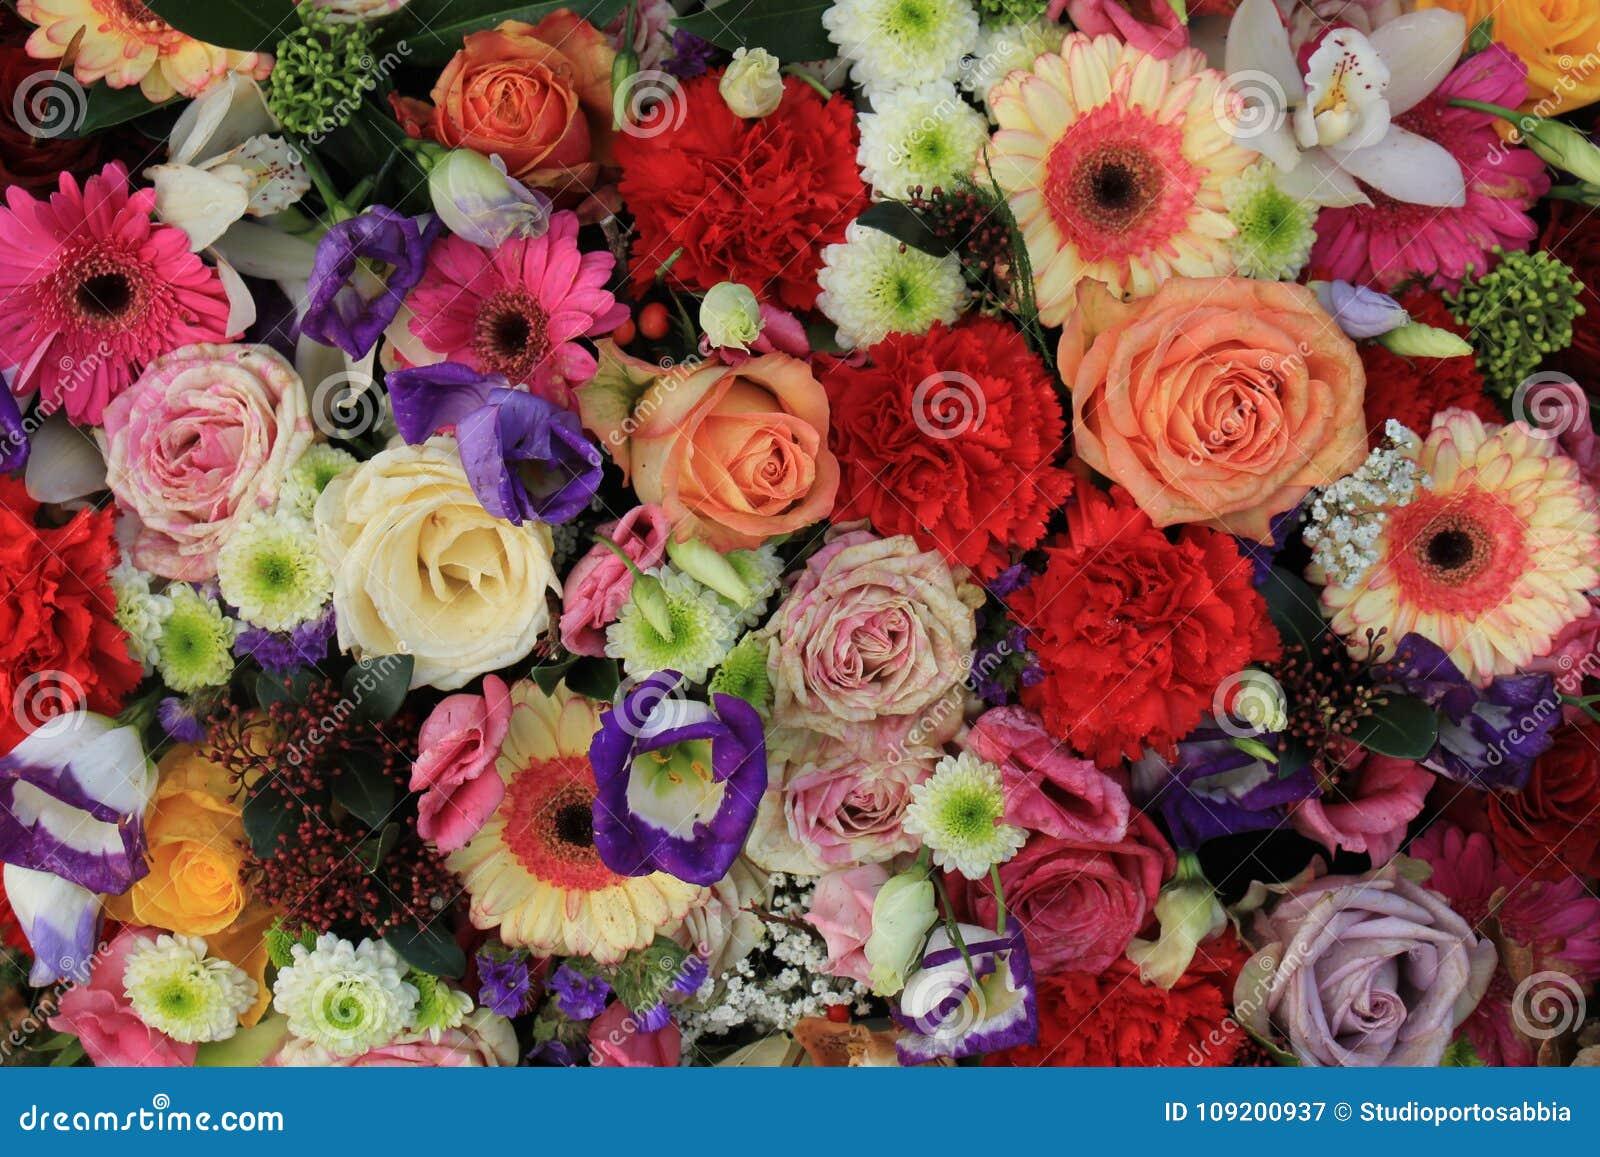 Colorful wedding flowers stock image. Image of chrysanthemum - 109200937